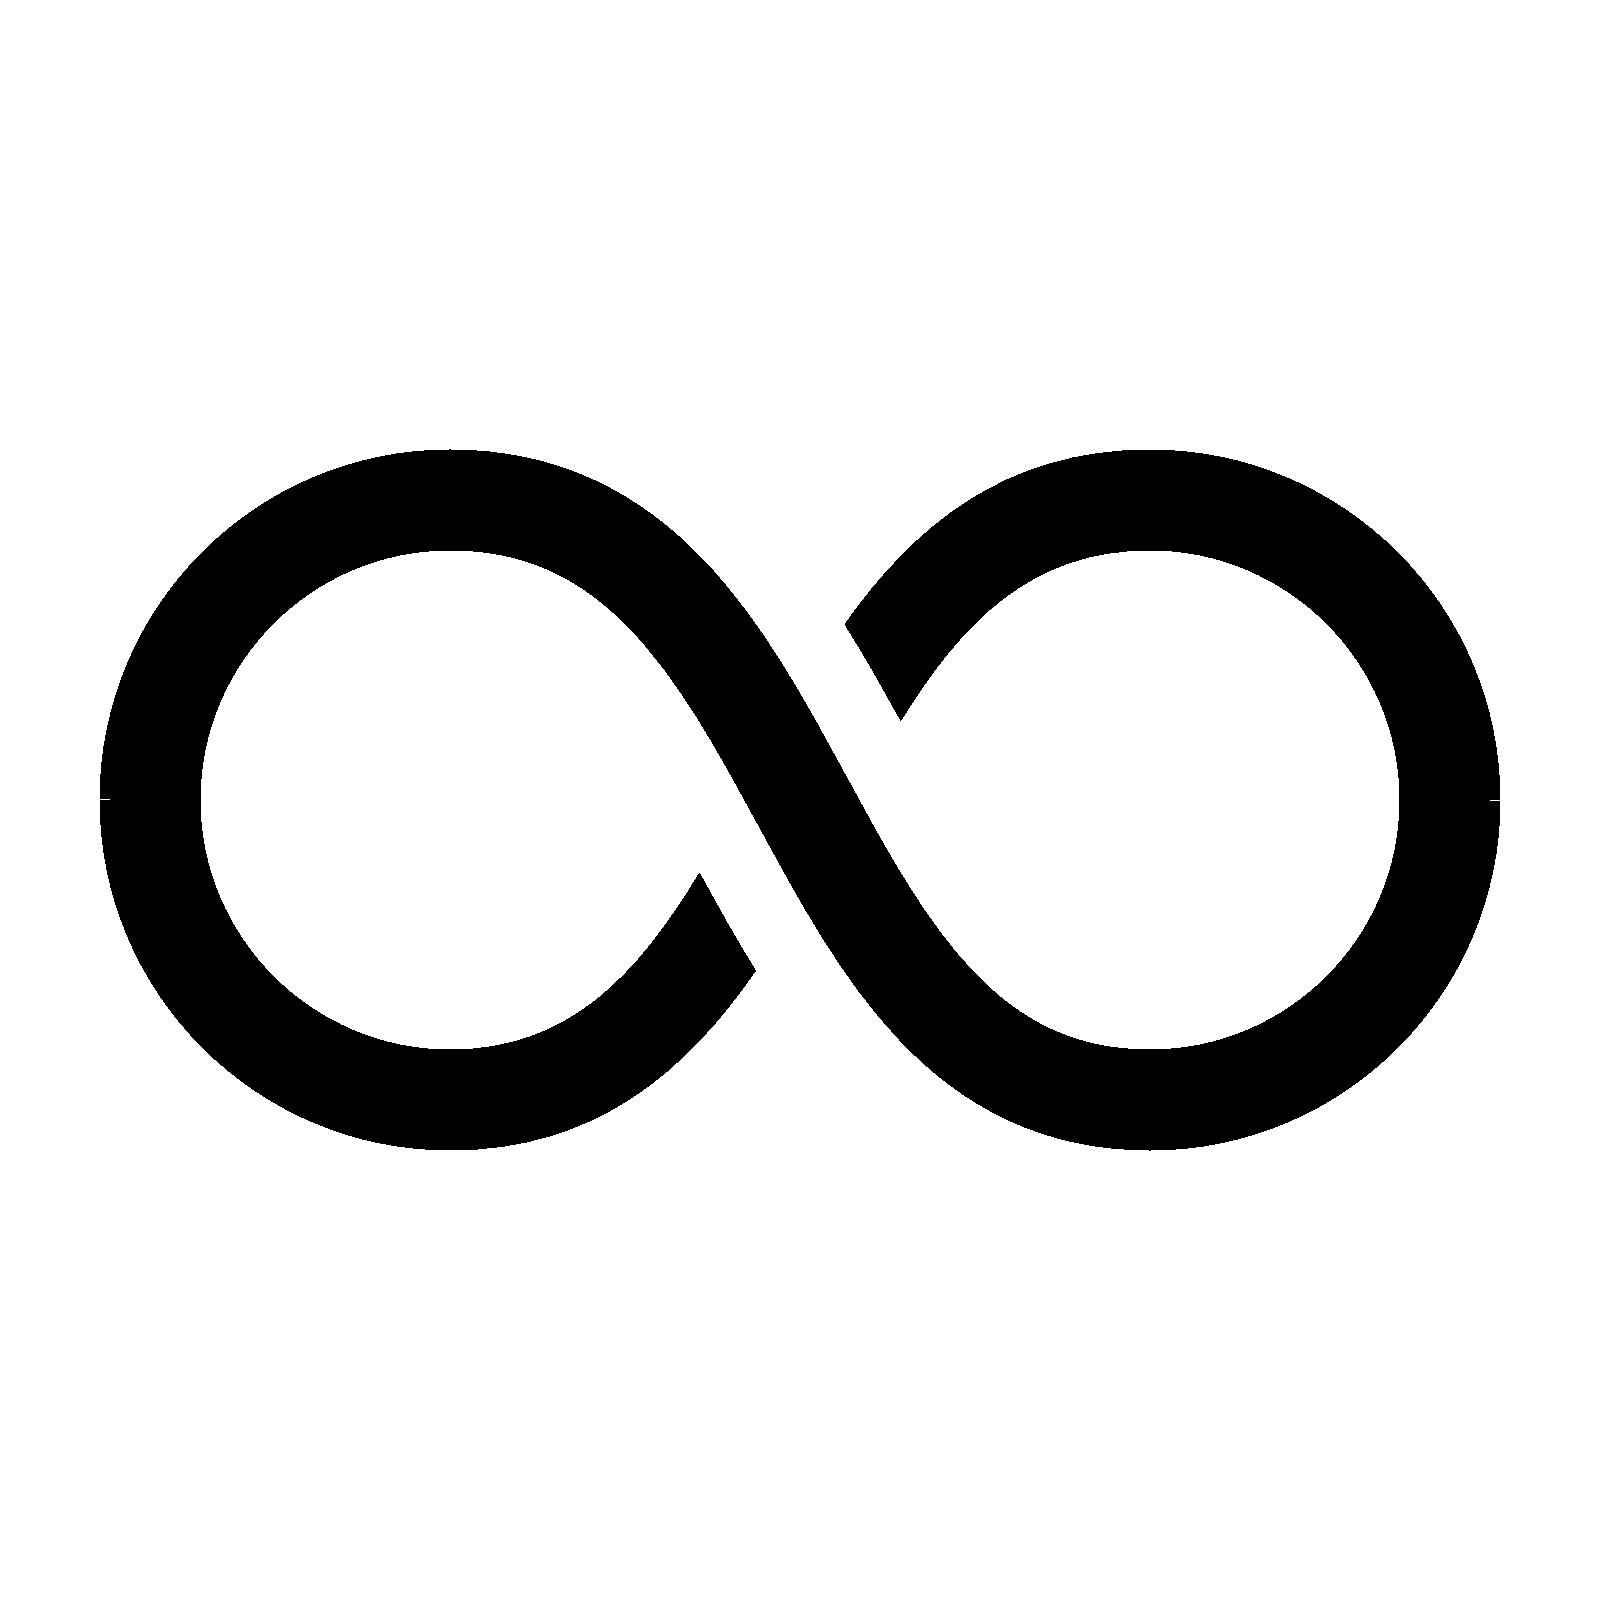 1600x1600 Infinity Clipart Infiniti